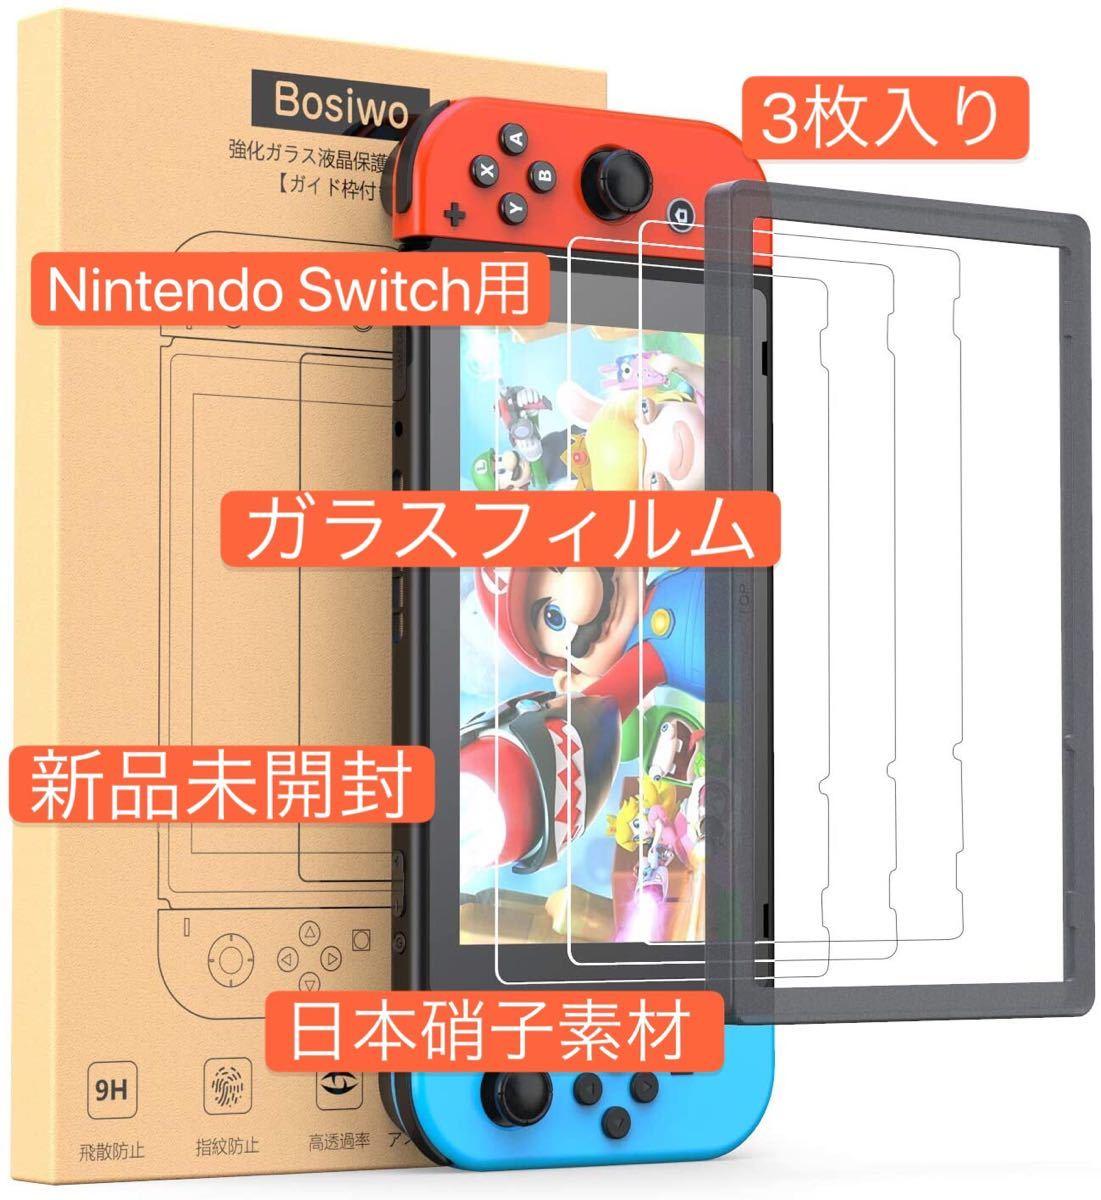 Nintendo Switch ガラスフィルム 任天堂 スイッチ 保護フィルム